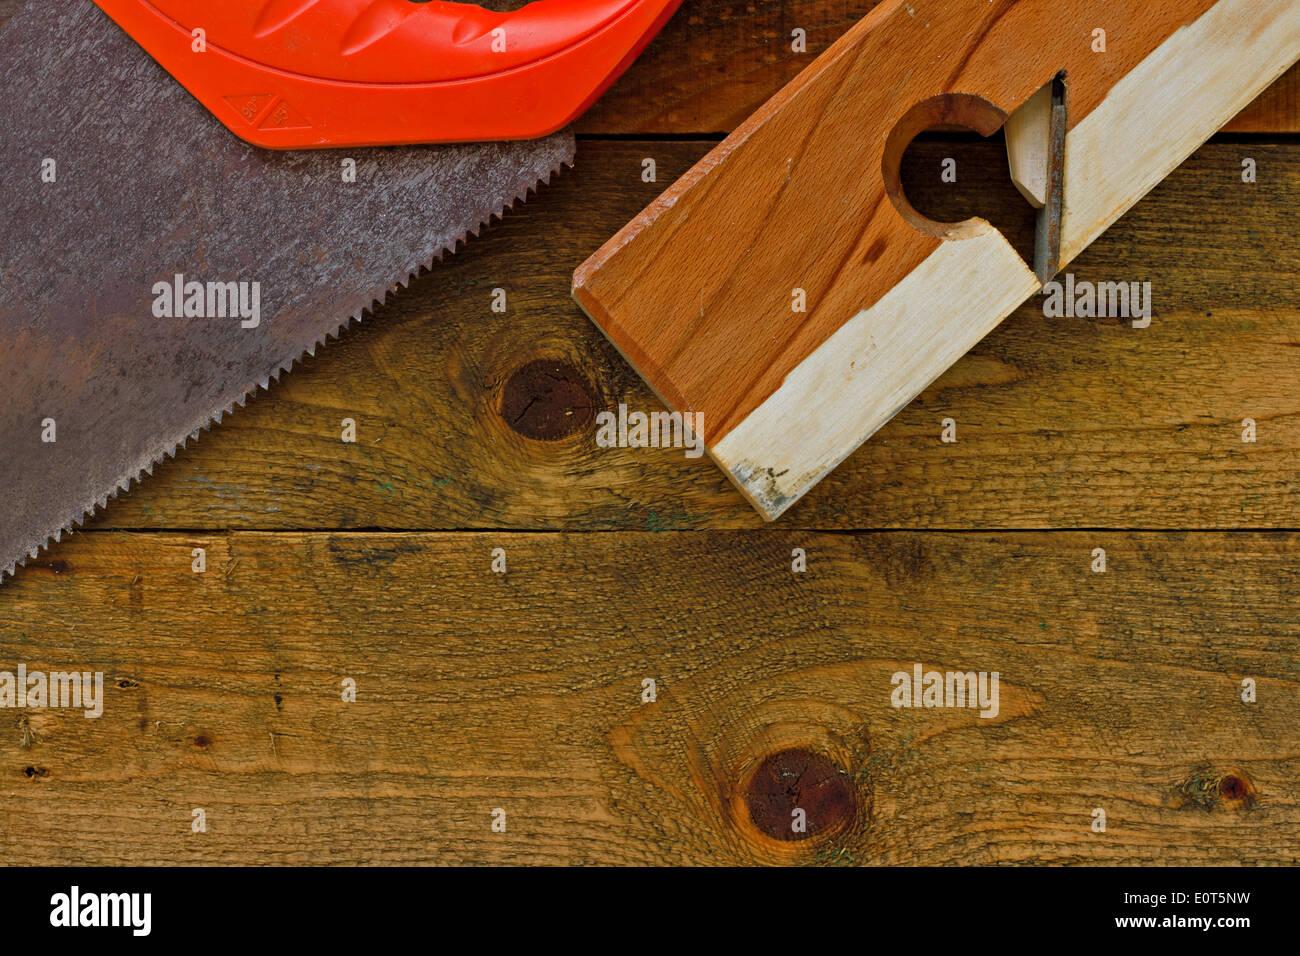 DIY-Tools auf rustikalen Tisch gelegt Stockfoto, Bild: 69372853 - Alamy